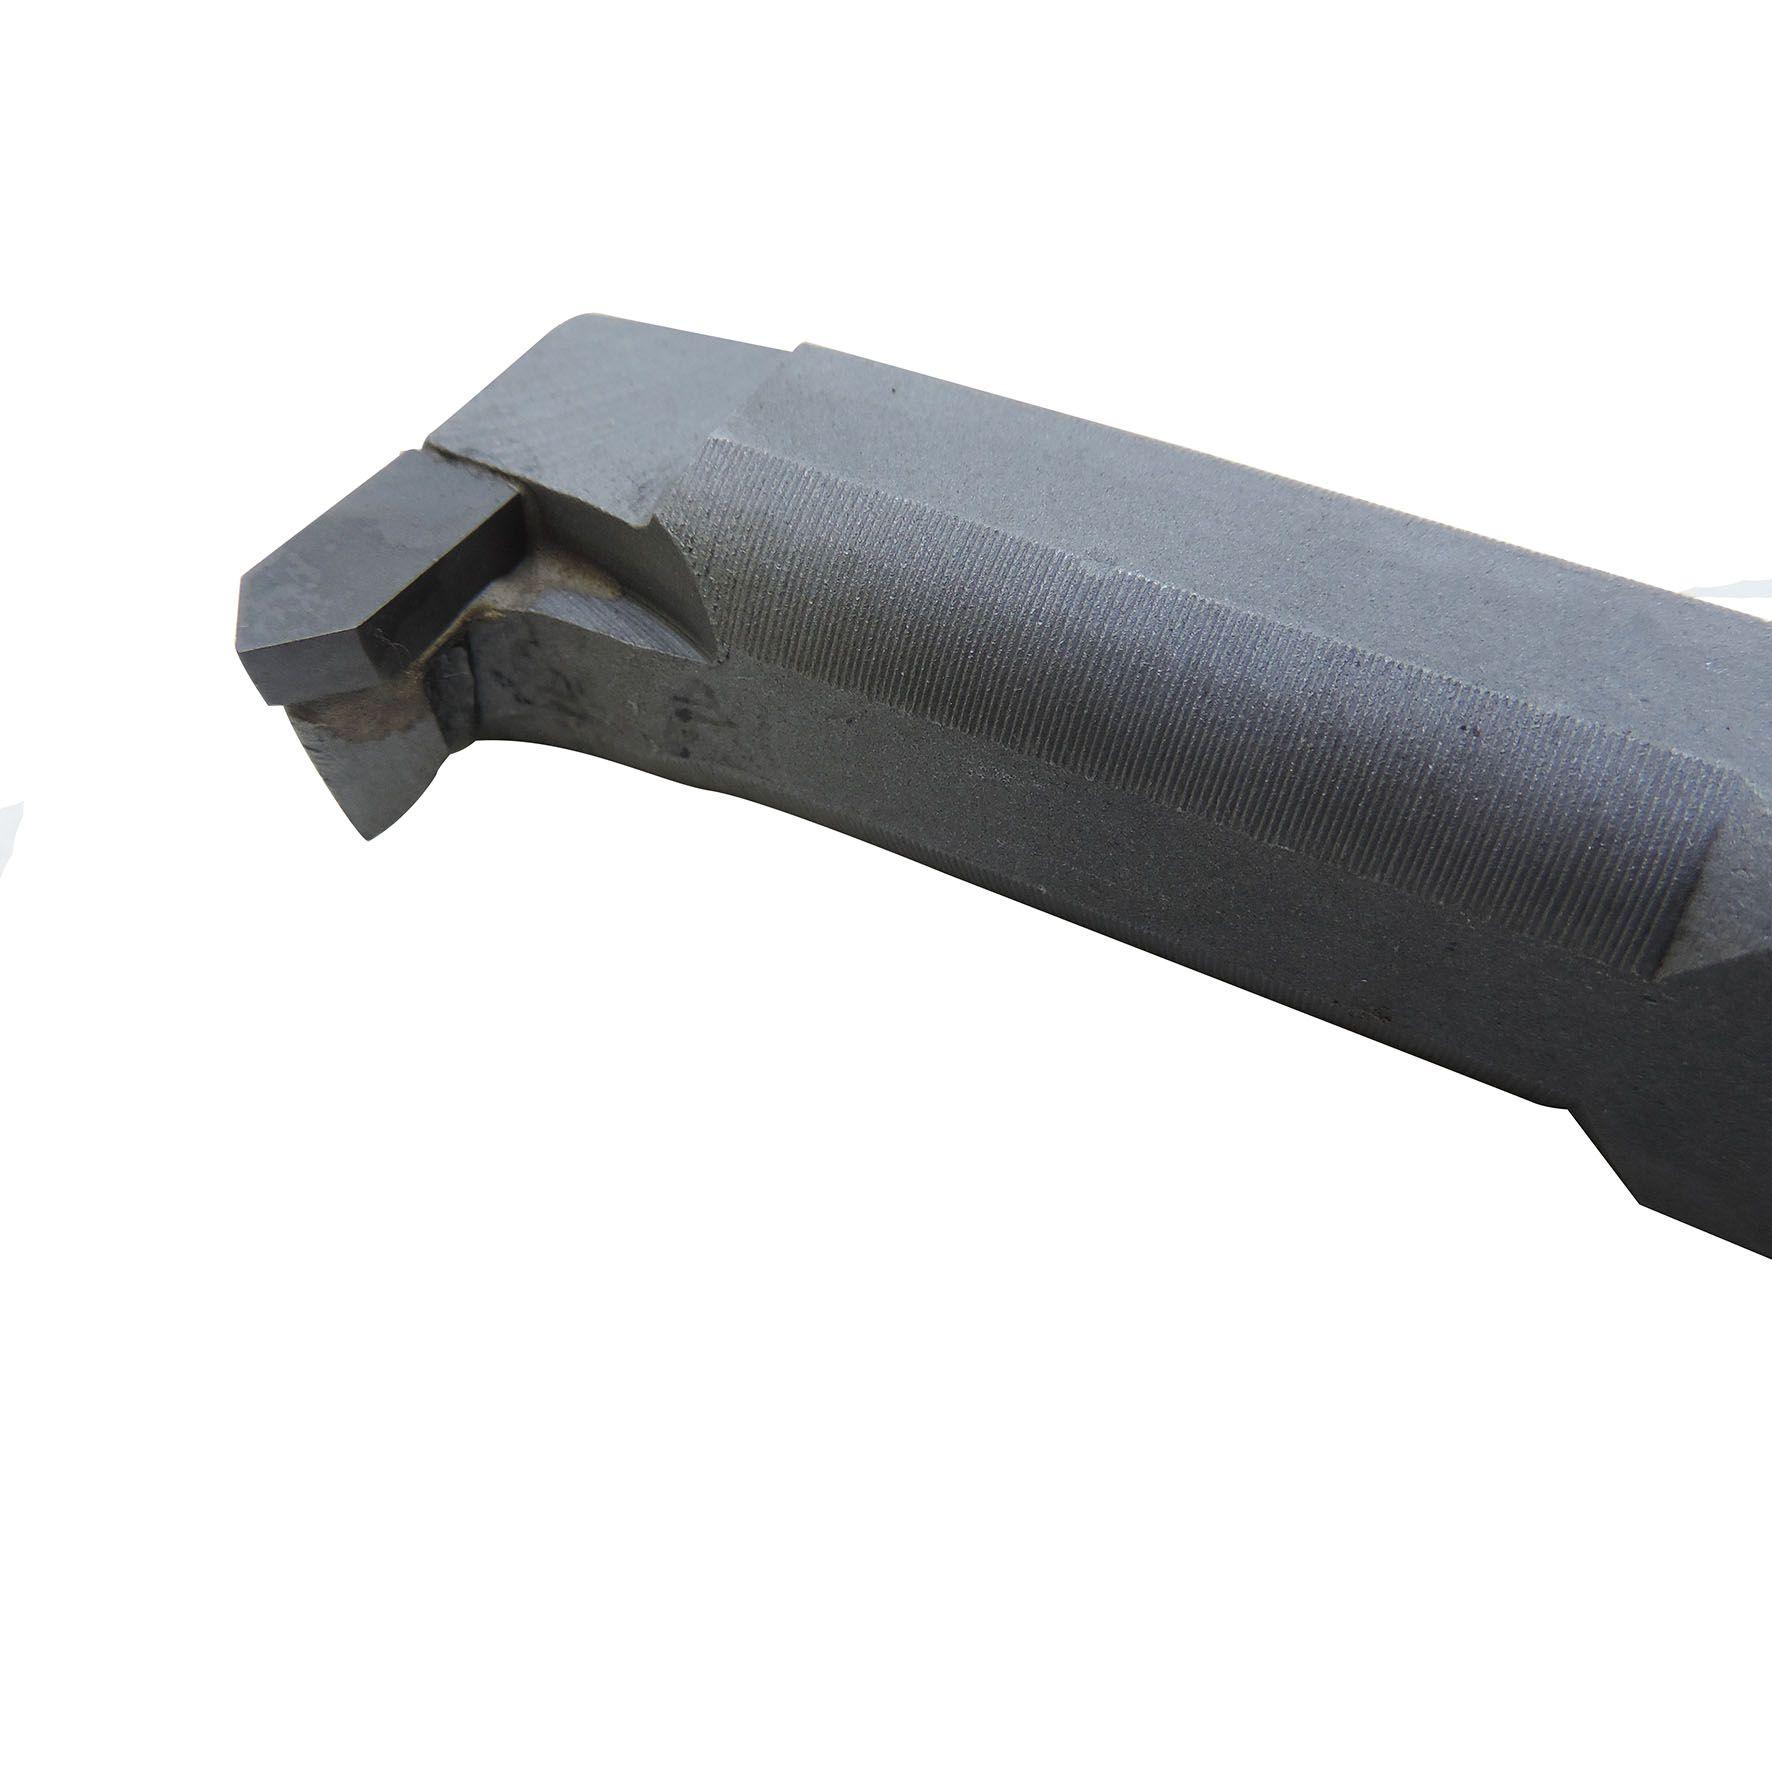 Ferramenta Soldada Torno Rosquear Interno Fri 2020 D P30